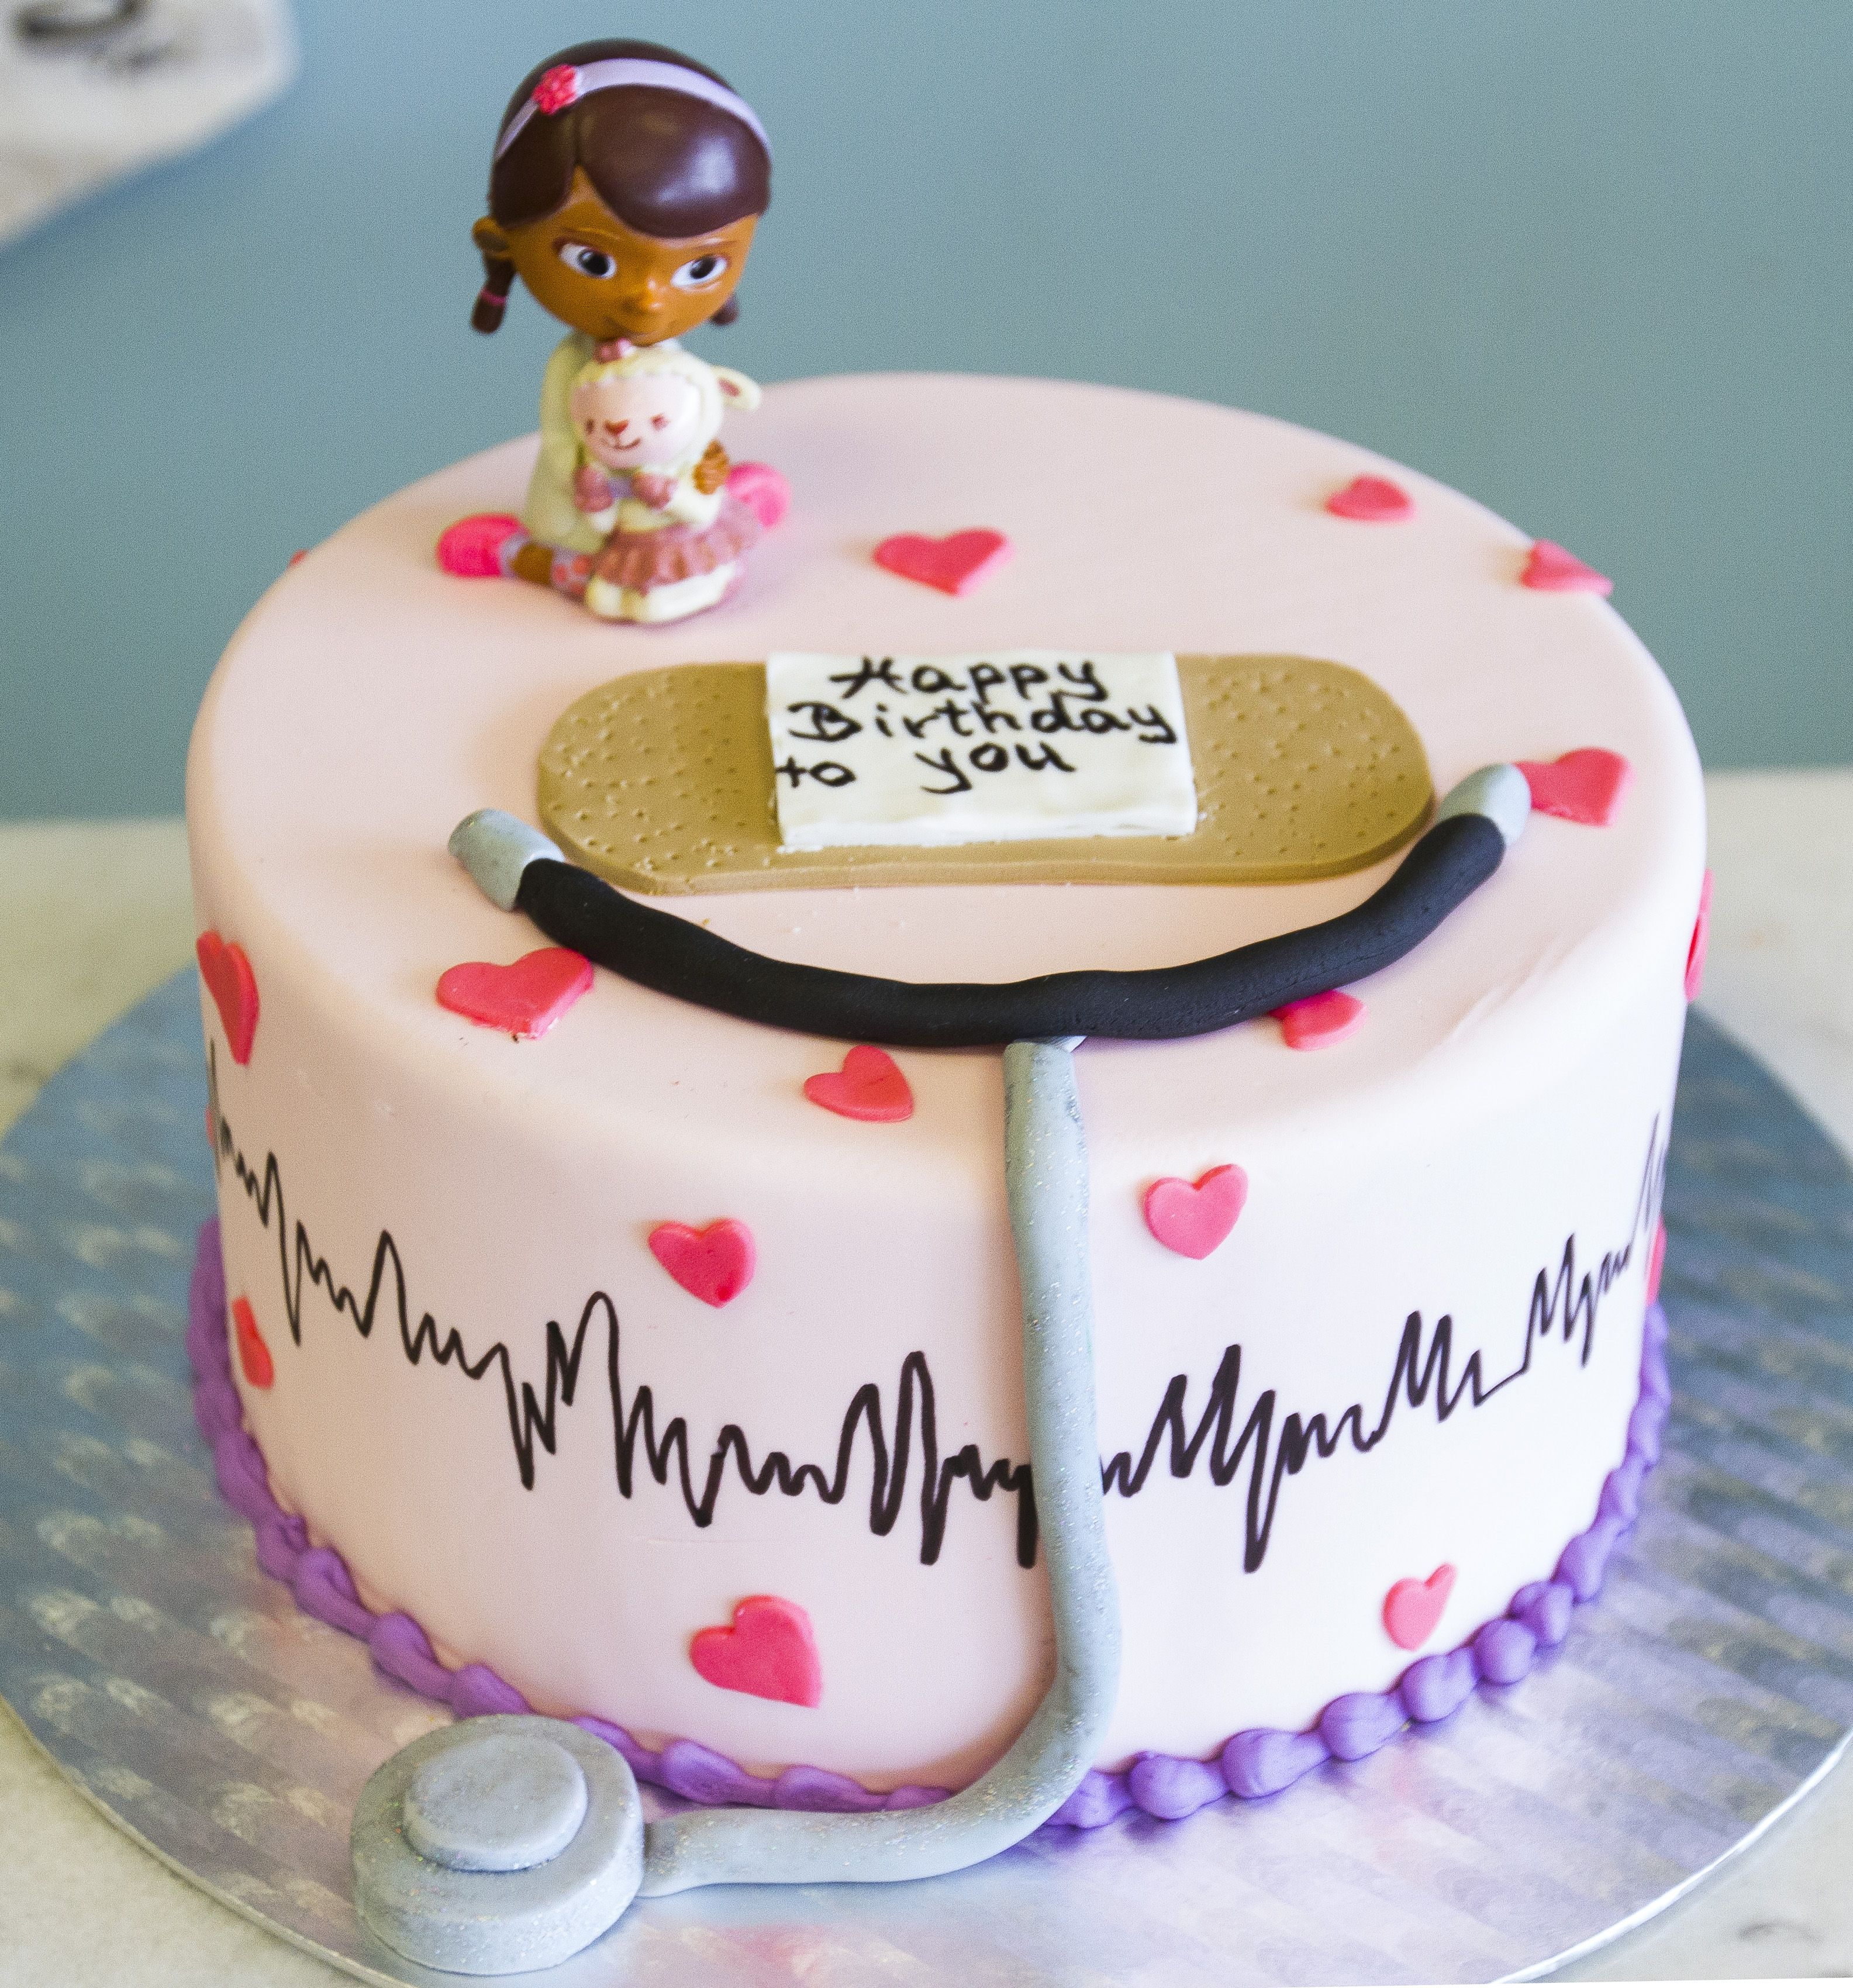 Fine Doc Mcstuffins Cake 162 Doc Mcstuffins Birthday Party Ideas Birthday Cards Printable Nowaargucafe Filternl